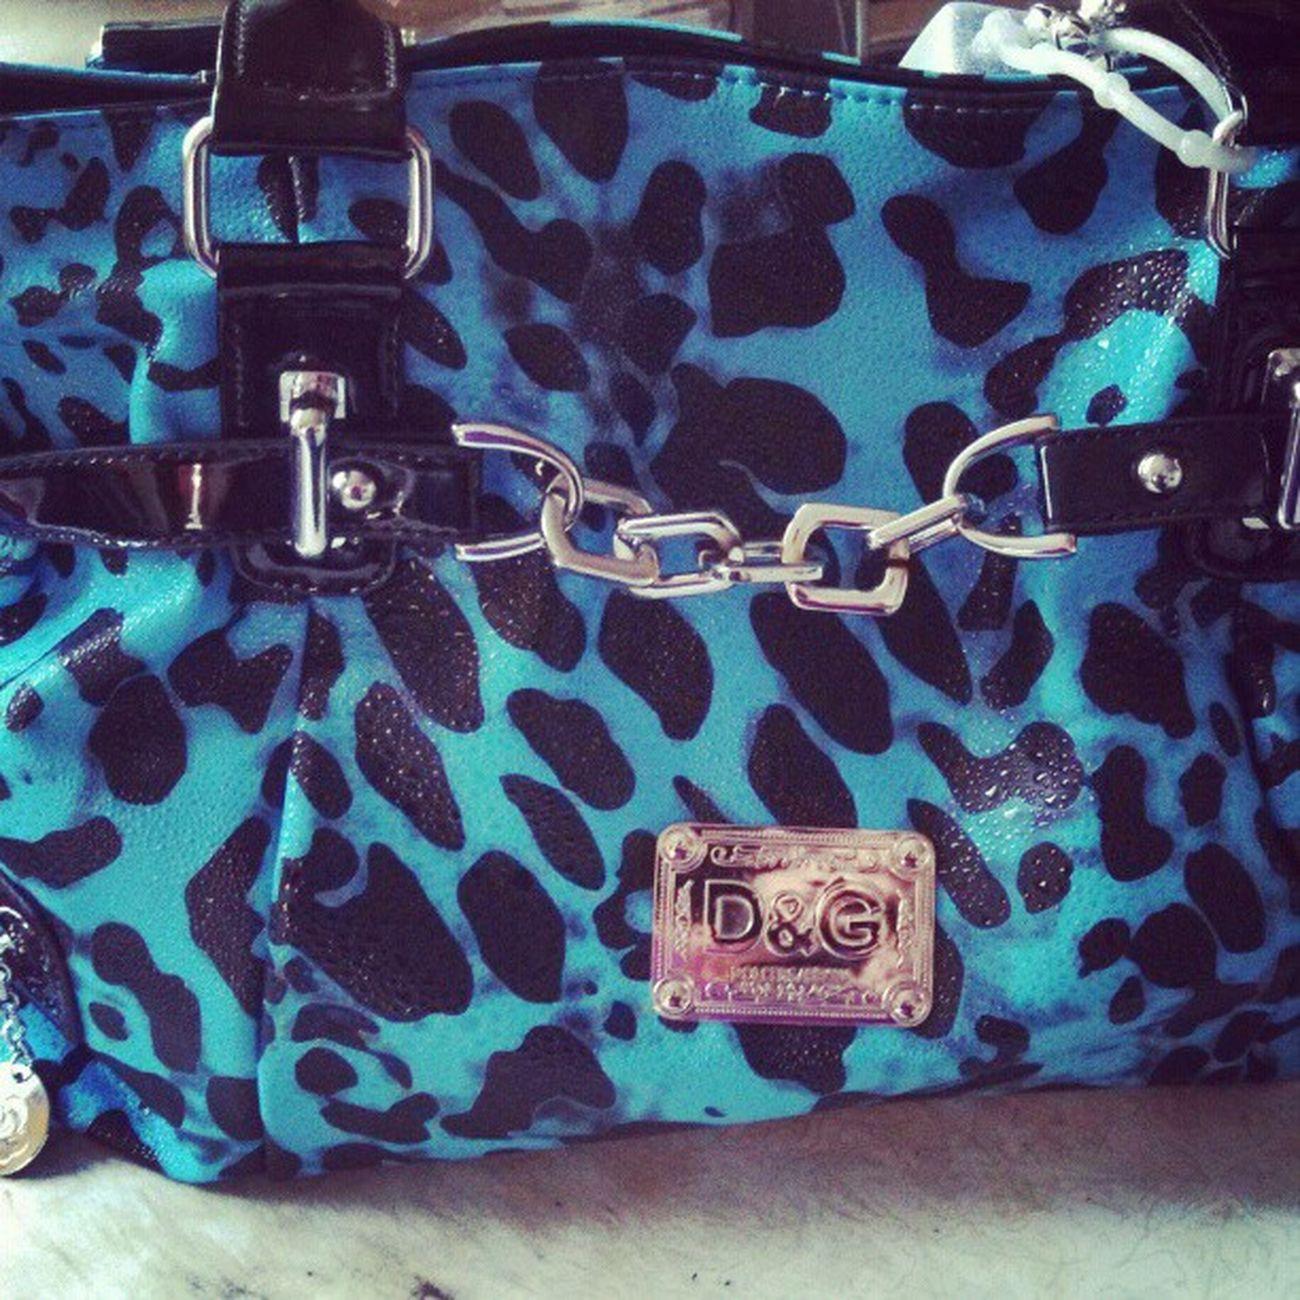 new purse! Dandg Purseaddiction Cheetah Love